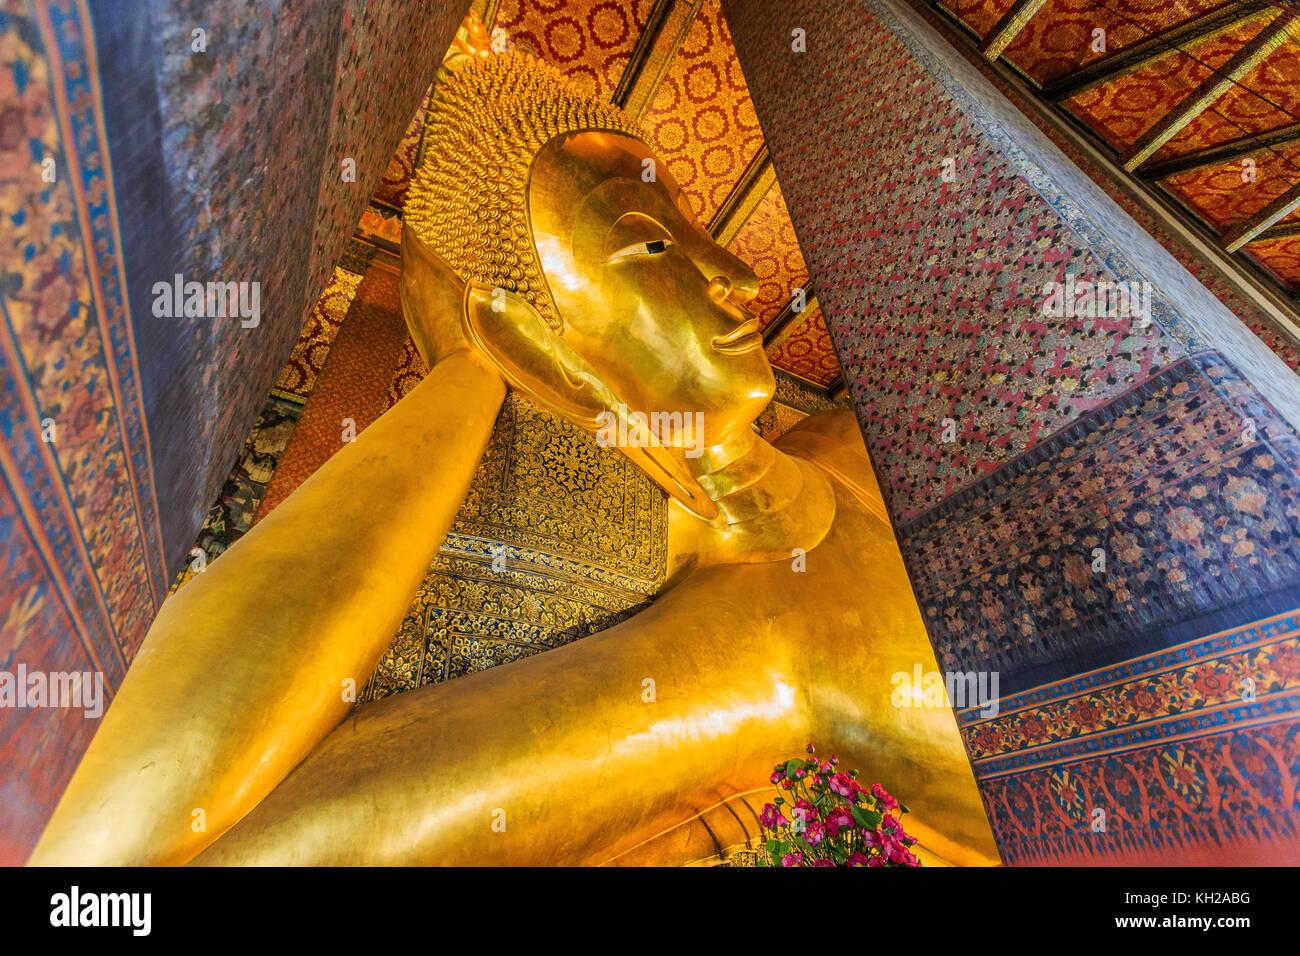 Bangkok, Tailandia. Buddha reclinato, statua d'oro di Wat Pho tempio. Immagini Stock